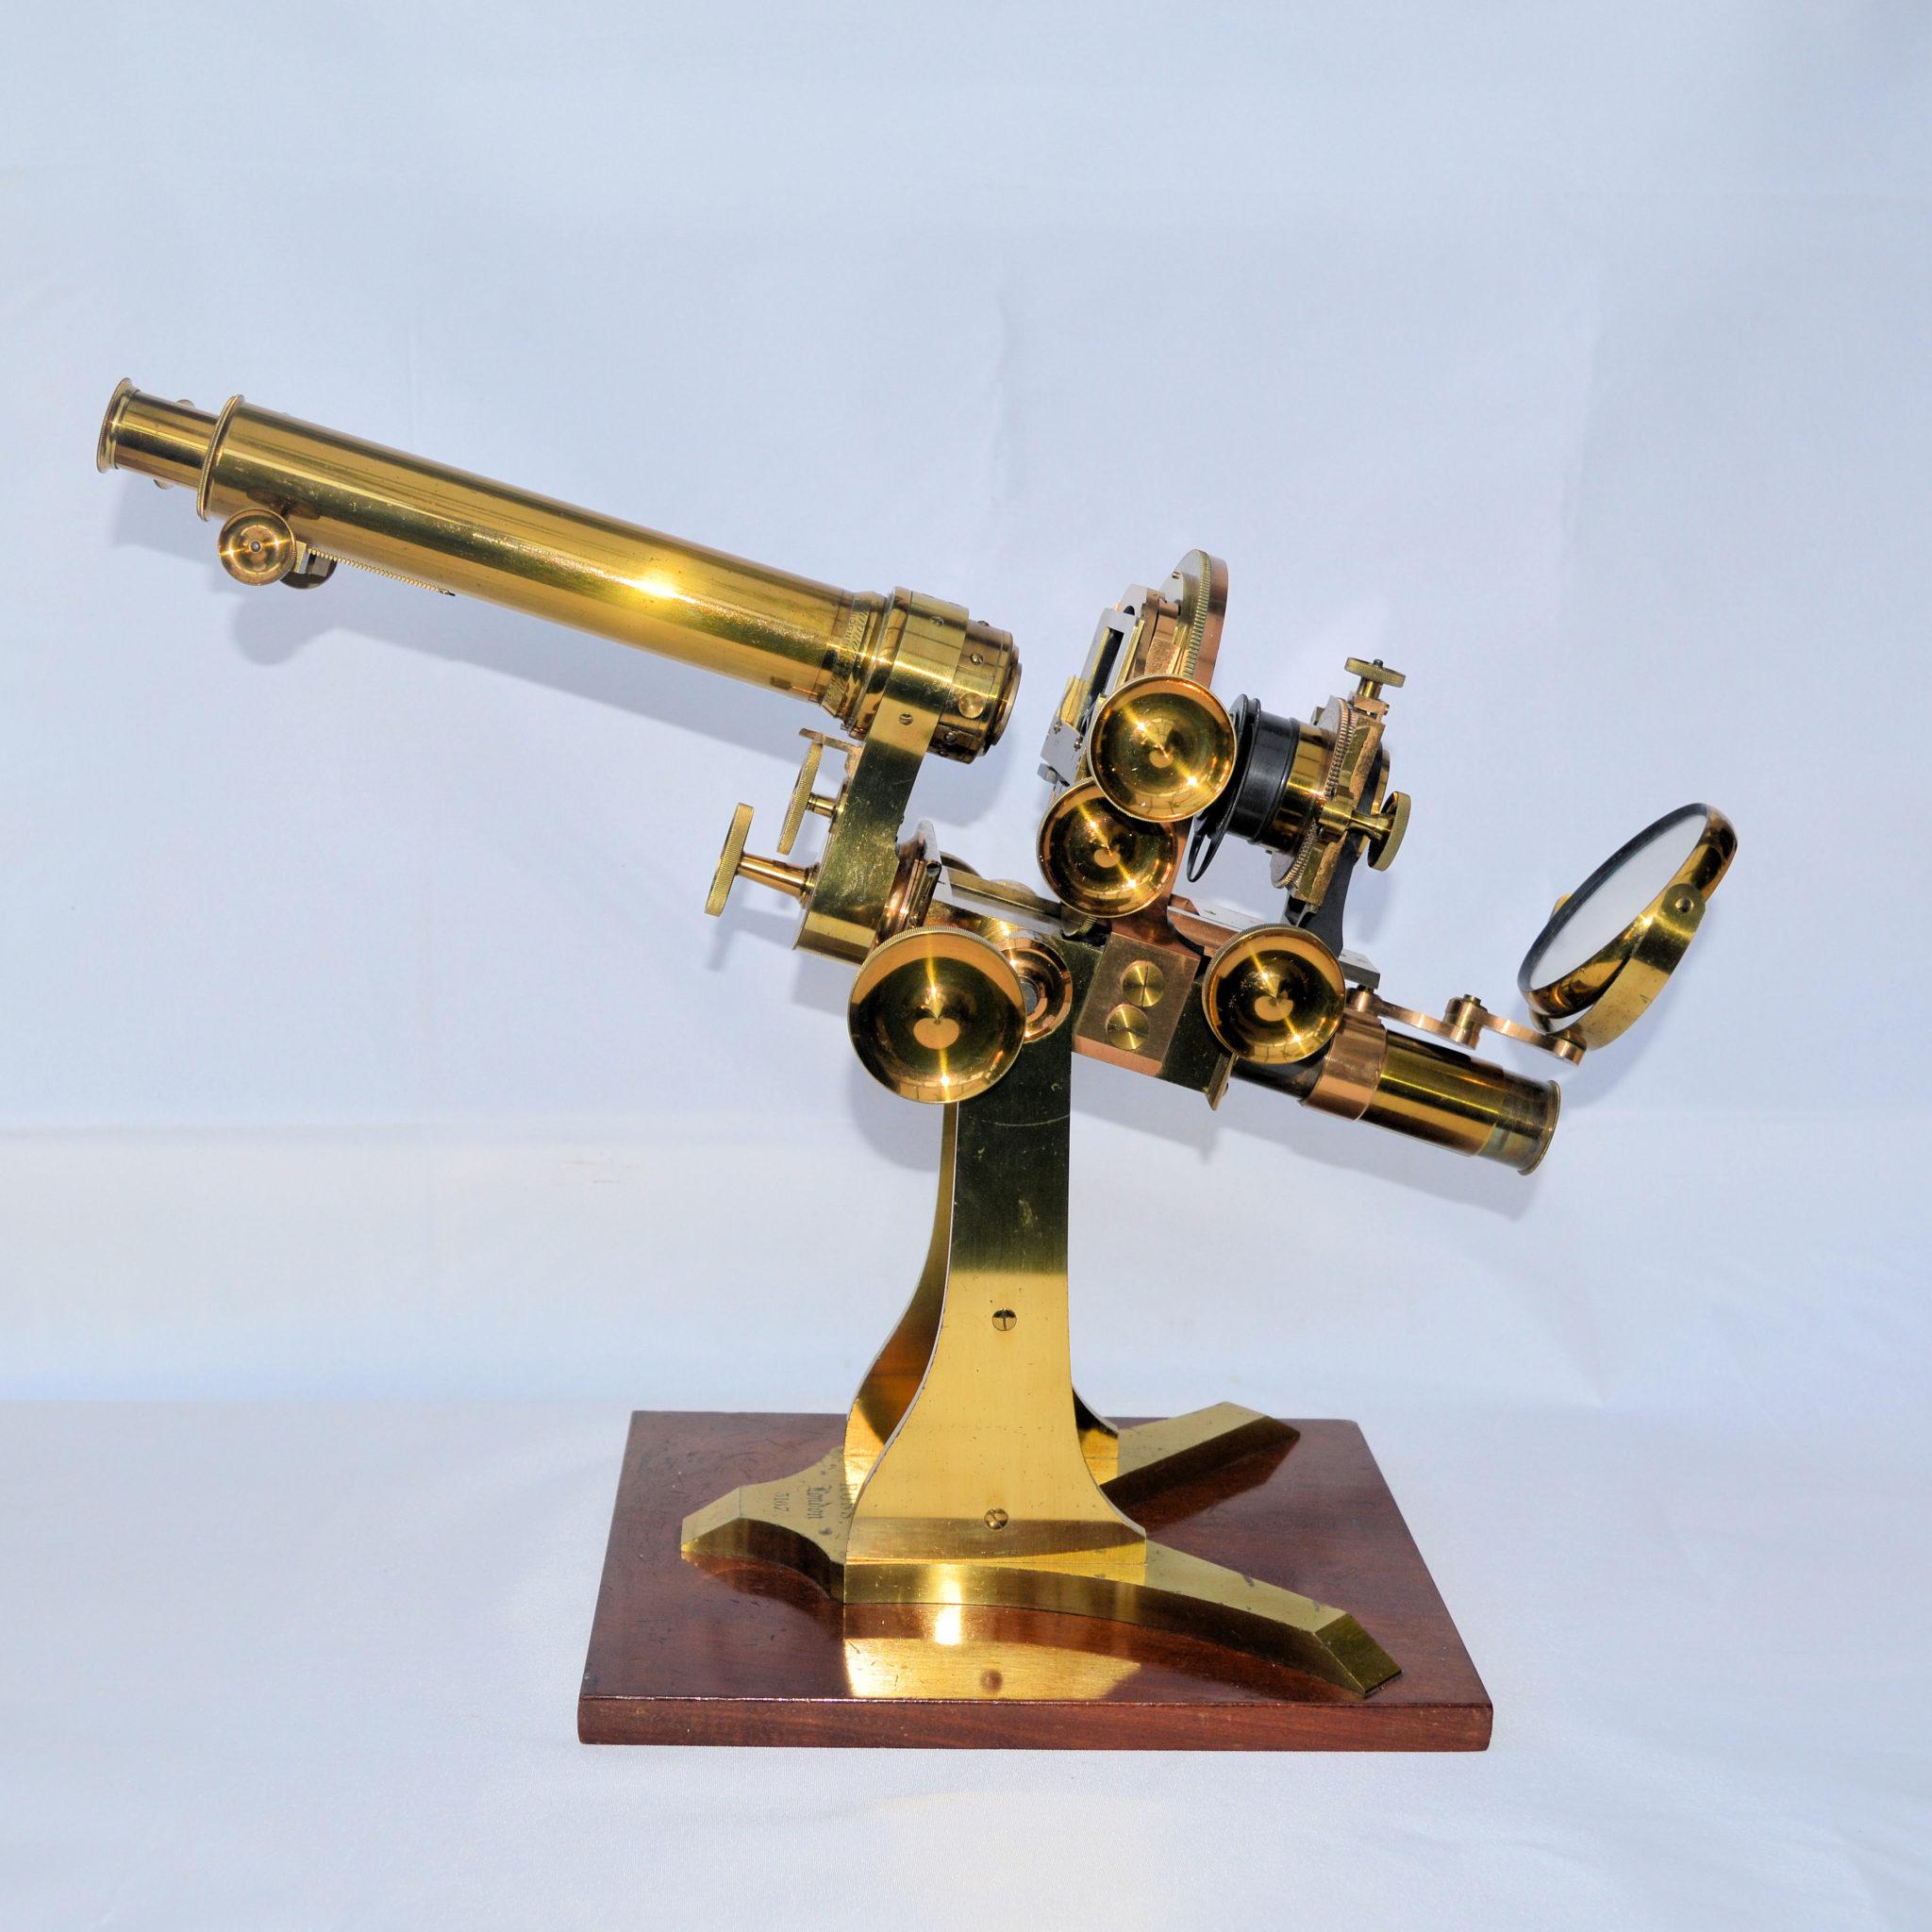 A large Wenham binocular microscope by Ross.